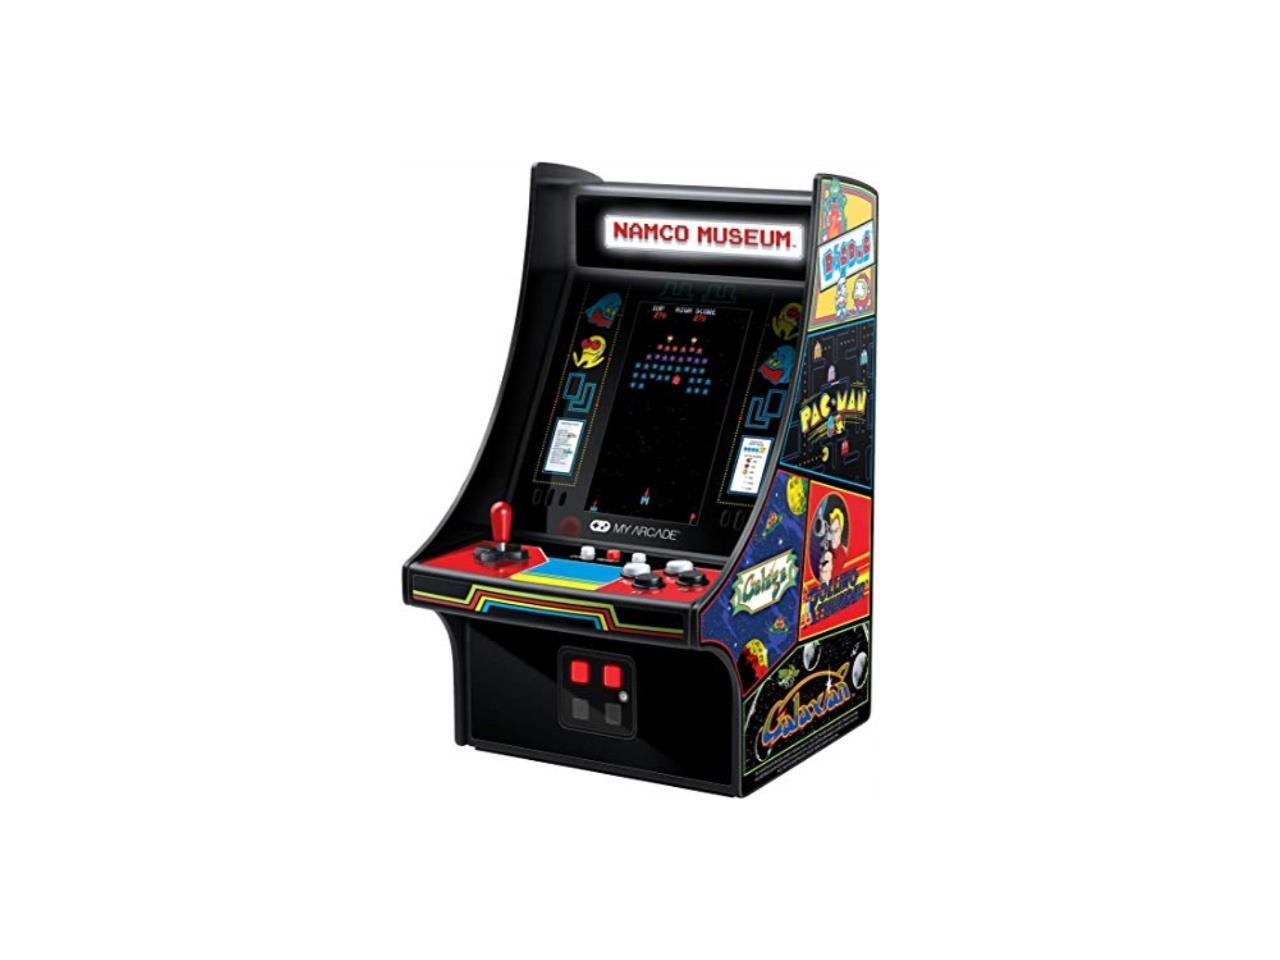 my arcade namco museum mini player 10 collectible retro arcade machine 20 arcade games pac man dig dug galaga galaxian rolling thunder and